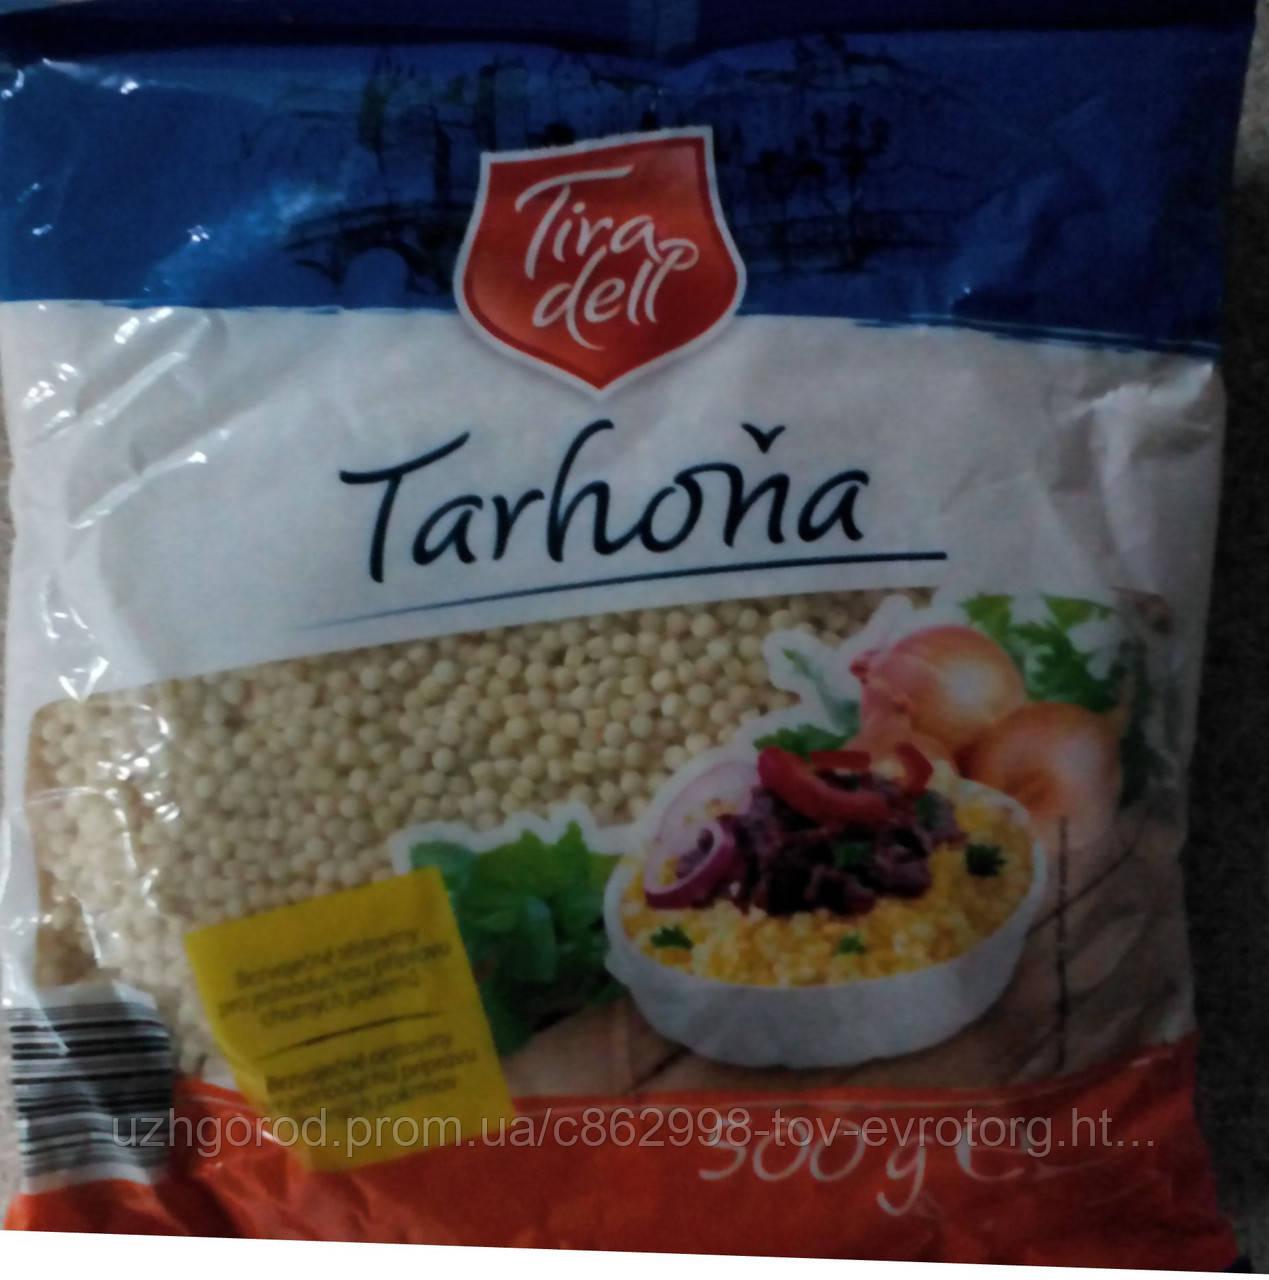 (Распродажа)Макароны Tiradell torhona 0.500 кг.